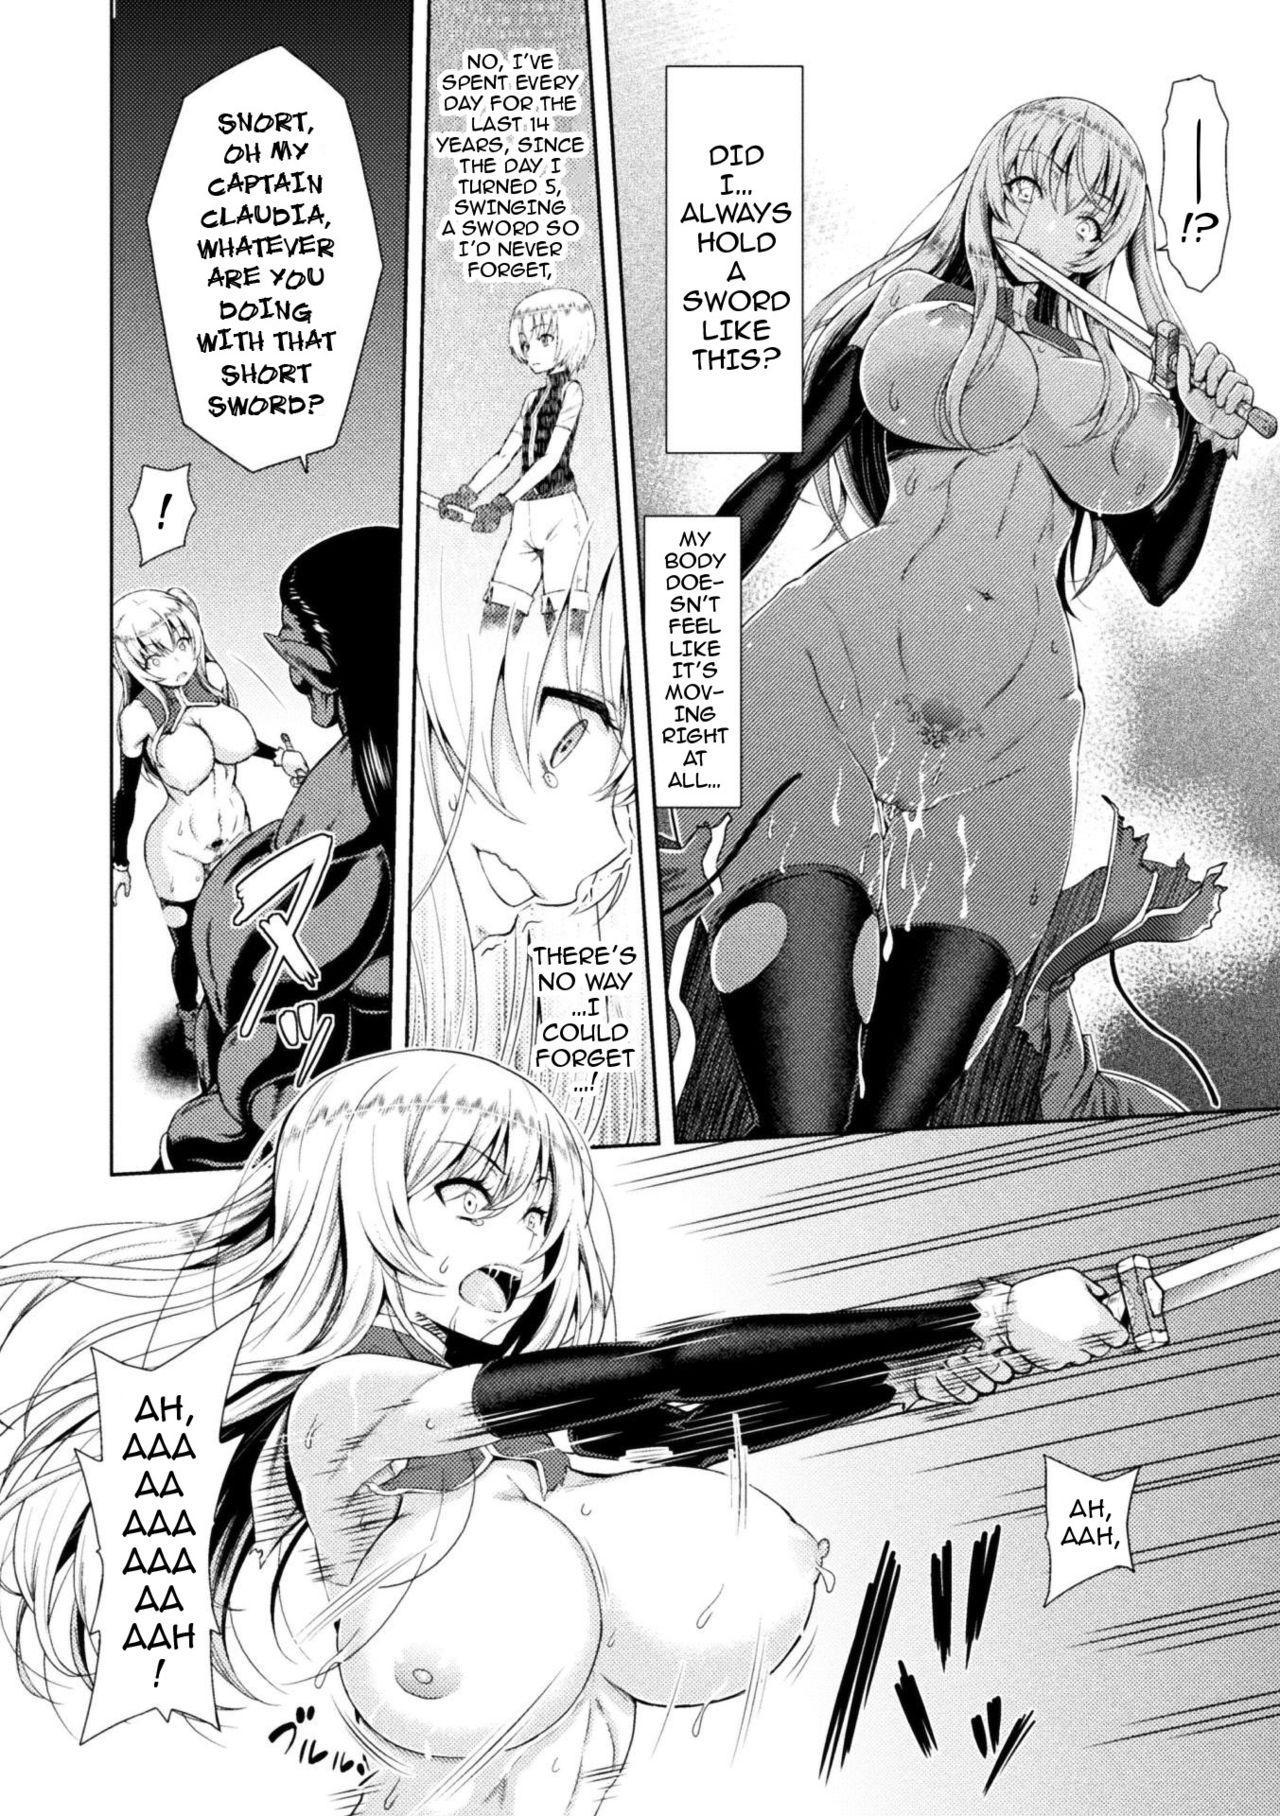 [Yamada Gogogo] Erona ~Orc no Inmon ni Okasareta Onna Kishi no Matsuro~ | Erona ~The Fall of a Beautiful Knight Cursed with the Lewd Mark of an Orc~ Ch. 1-5 [English] {darknight} 42